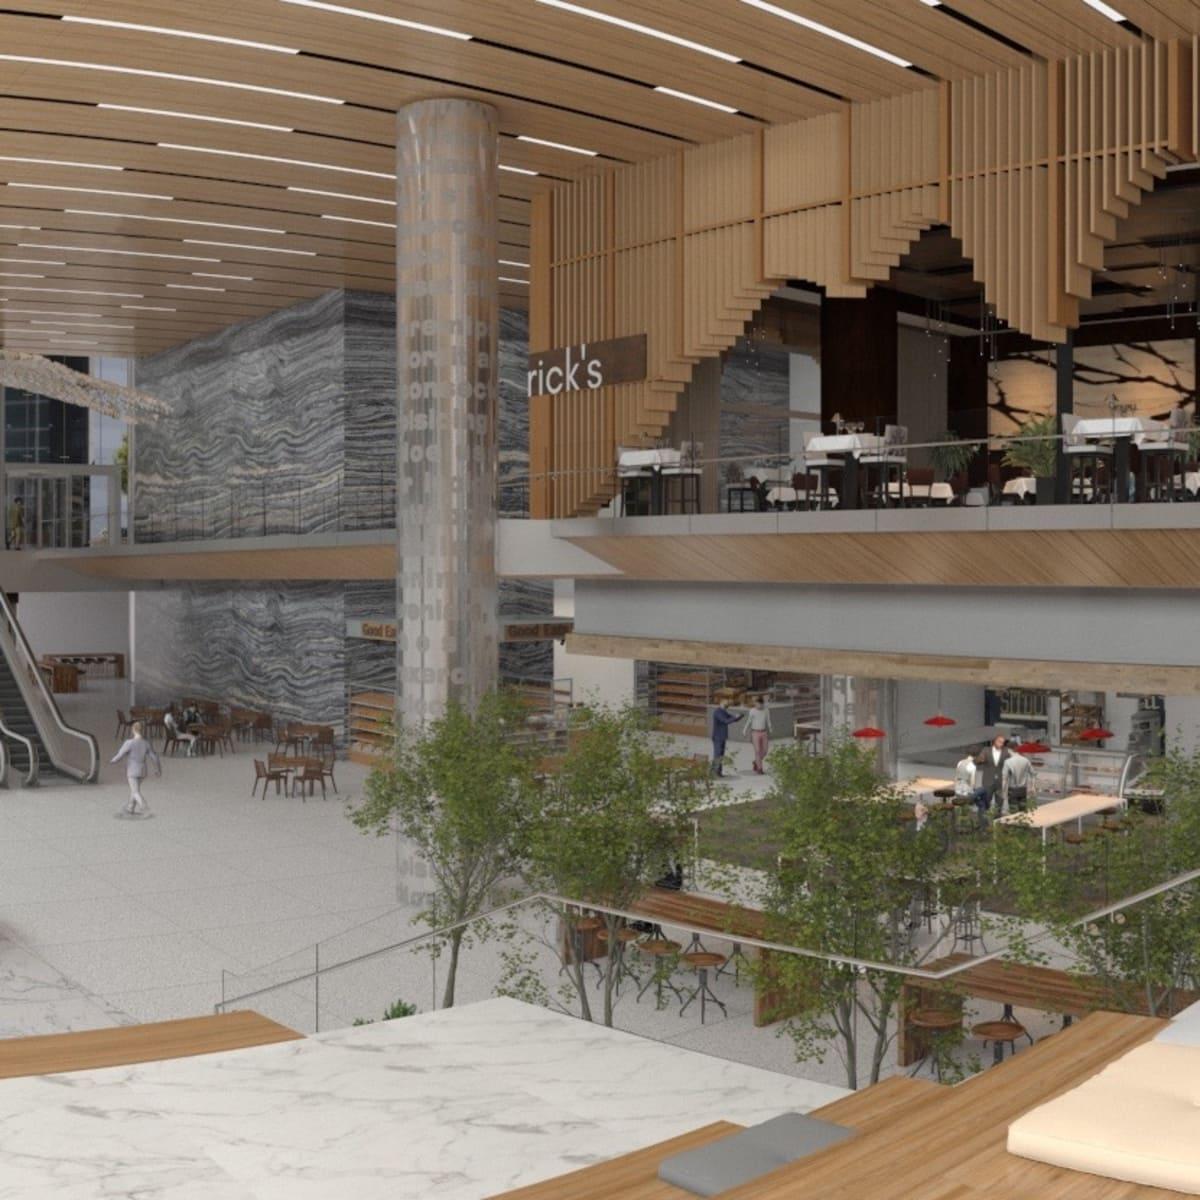 Capitol Tower steps in VR rendering